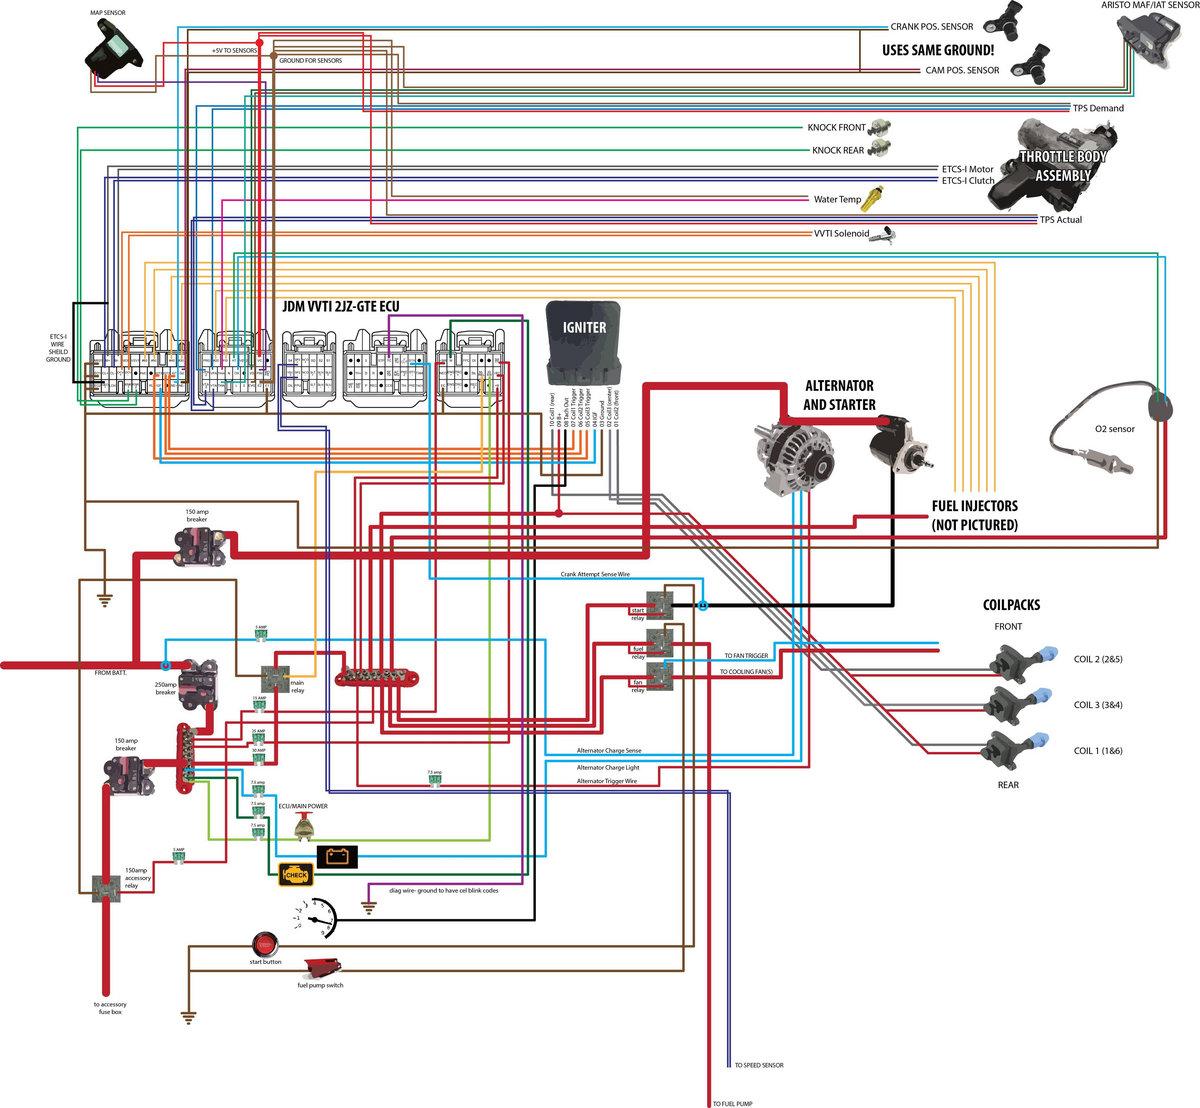 Denso Ignition Coil Pdf Download Nitzaporgwaltjar Autoshop101 Wiring Diagrams By Malins